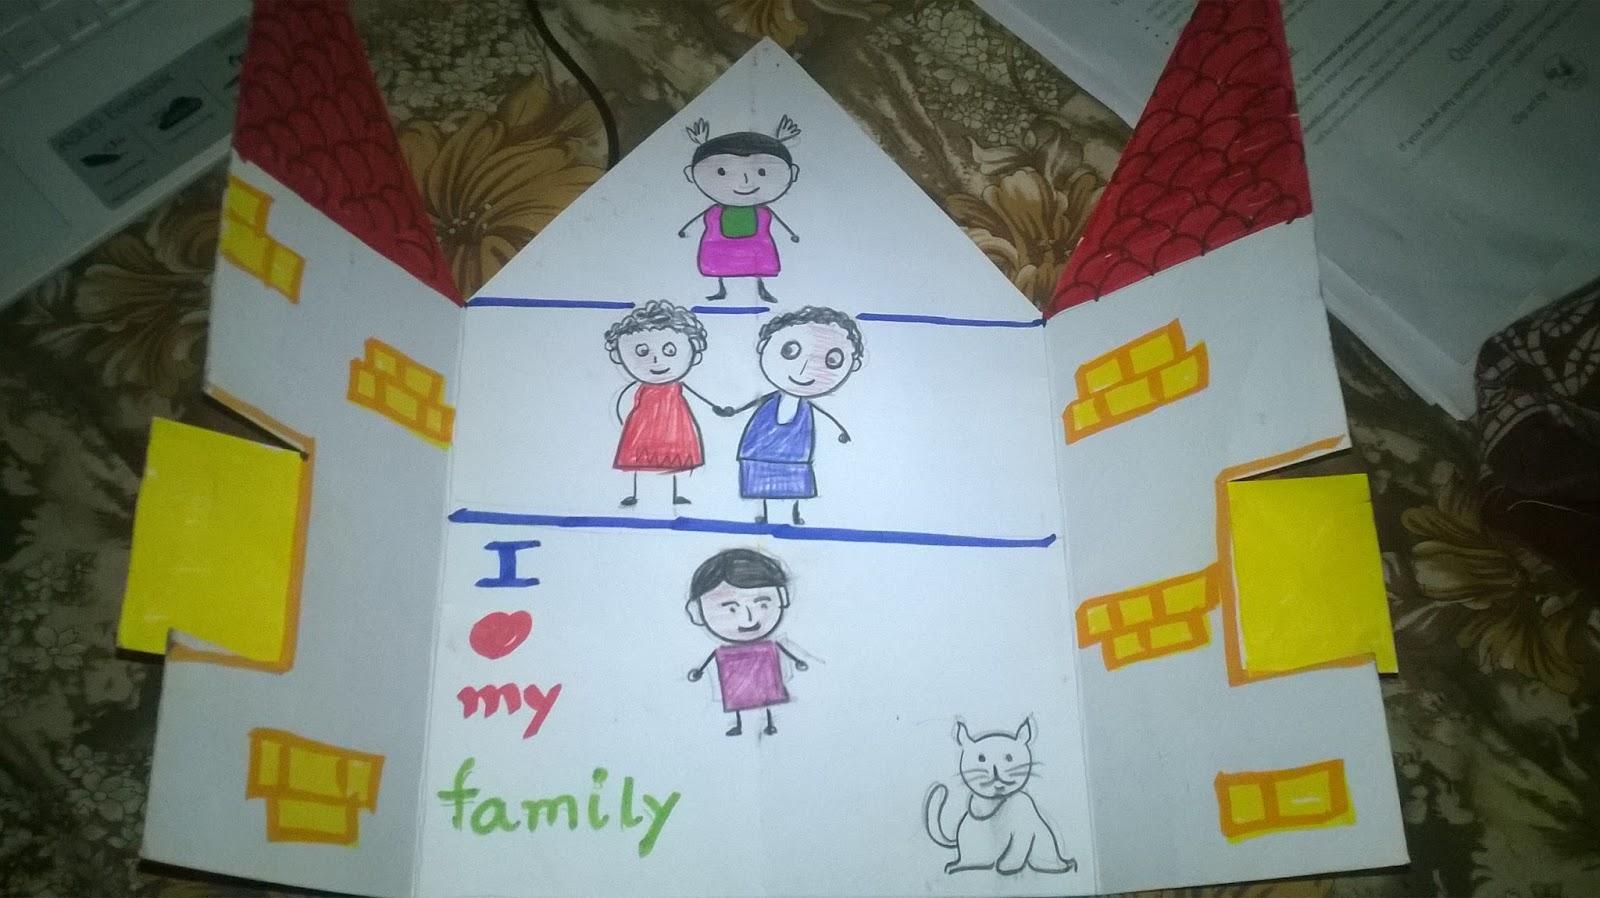 My Family Innovative Model